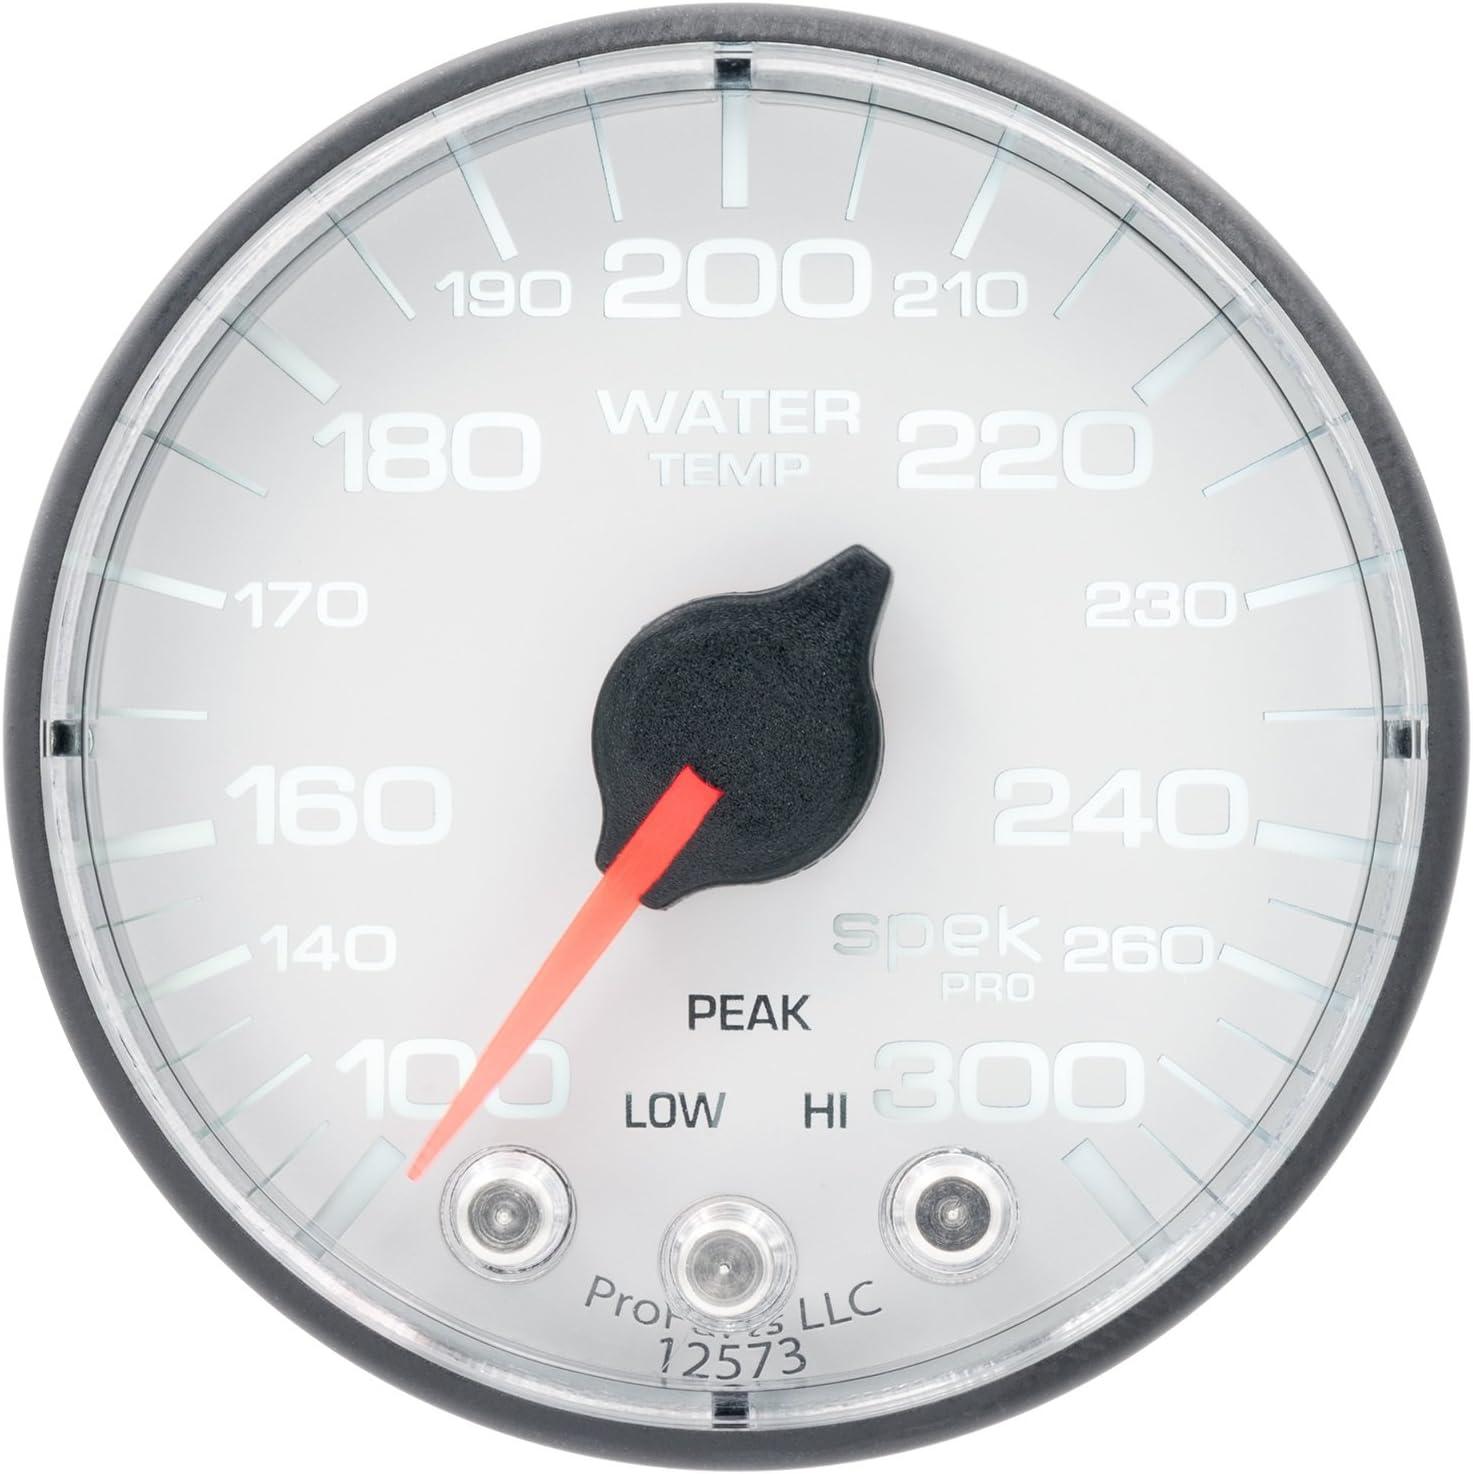 AutoMeter P346128 Gauge Water Temp Spek-Pro 2 1//16, 300/ºf, Stepper Motorwith Peak /& Warn, Wht//Blk, Spek-Pro